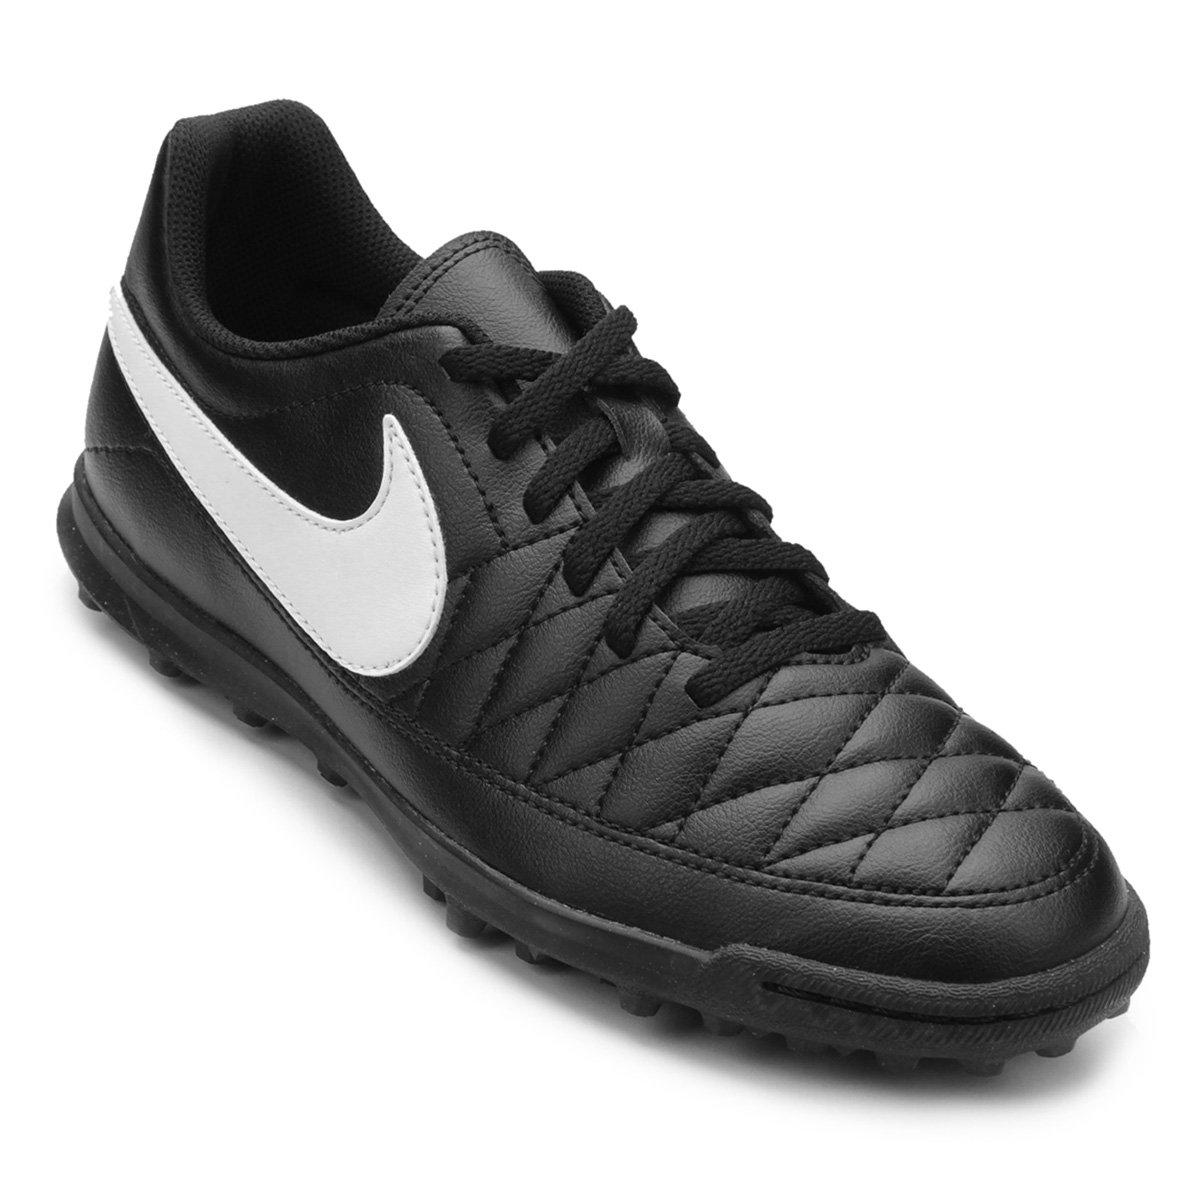 a31d025b736d6 Chuteira Society Nike Majestry TF - Preto e Branco - Compre Agora ...